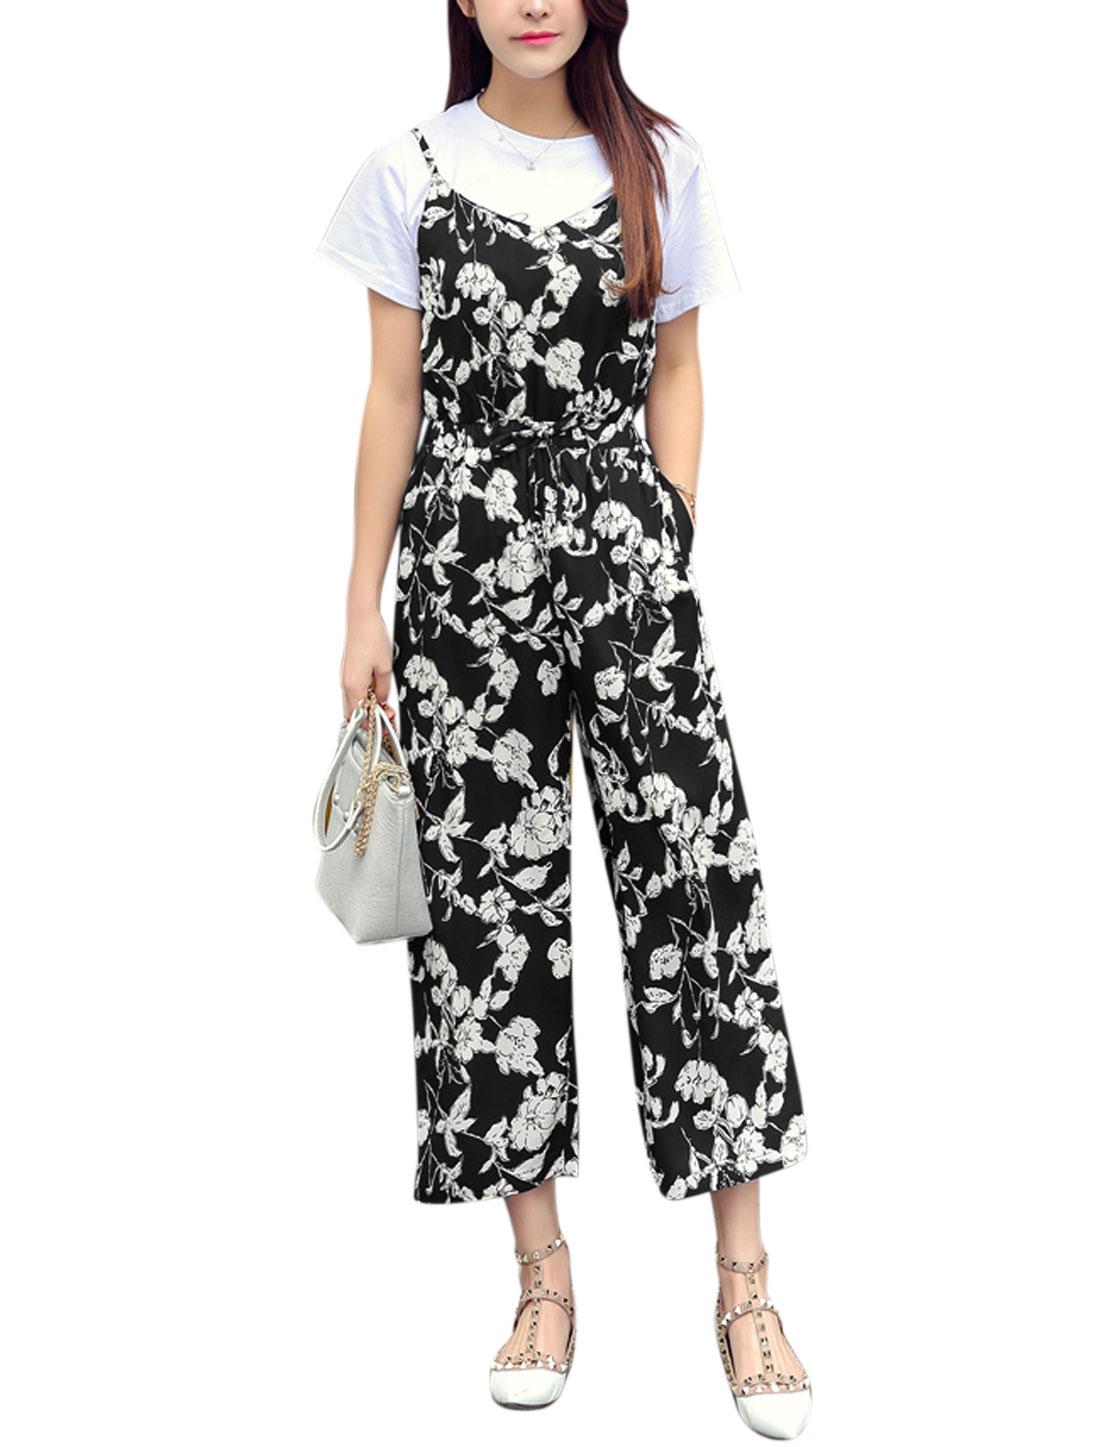 Women Scoop Neck Sleeveless Floral Prints Wide Leg Jumpsuit Black XS